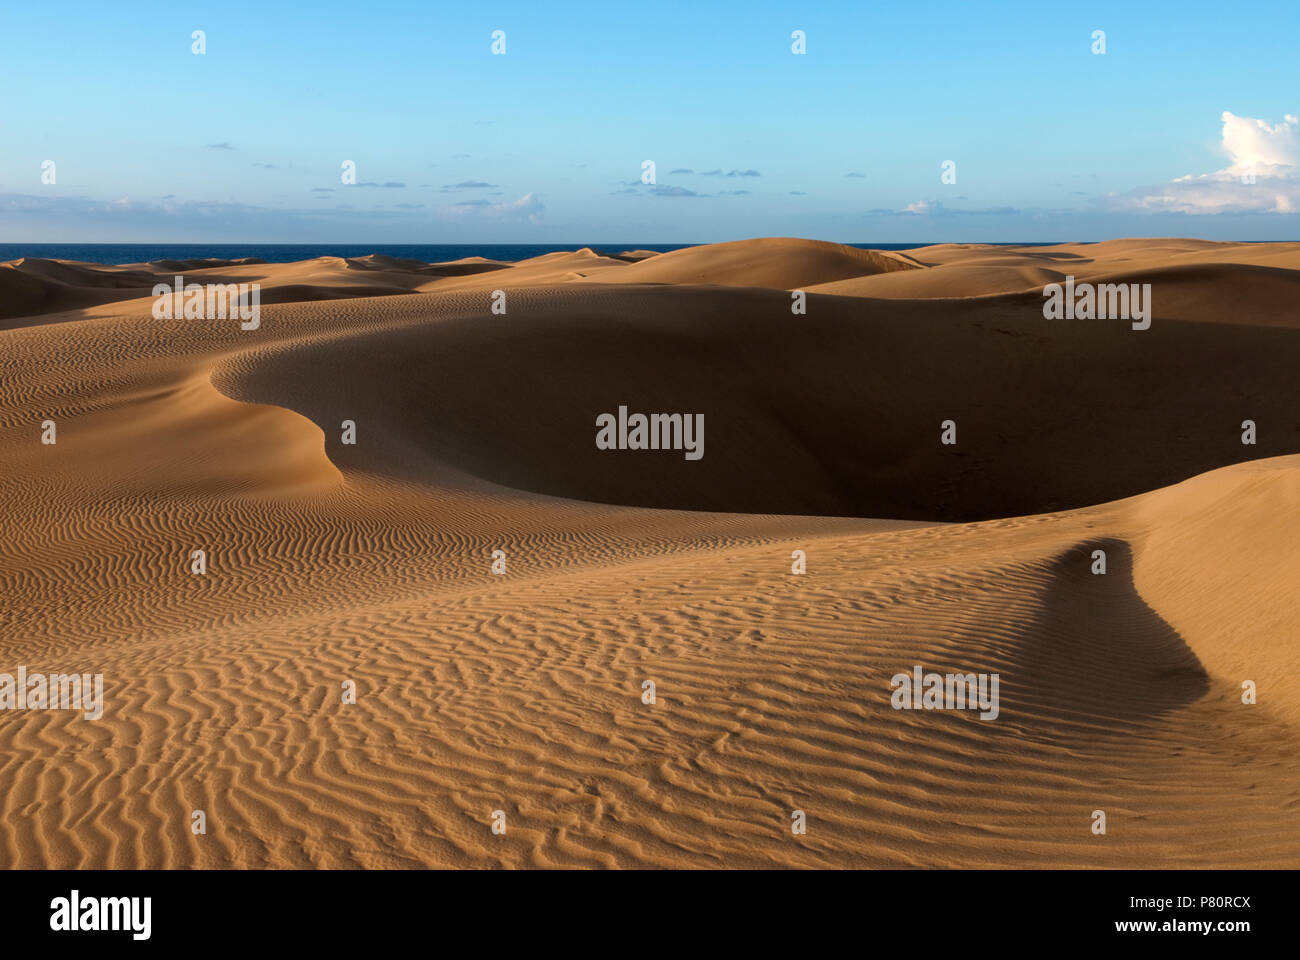 Dünen von Maspalomas, Gran Canaria, Kanarische Inseln, Spanien Stockfoto